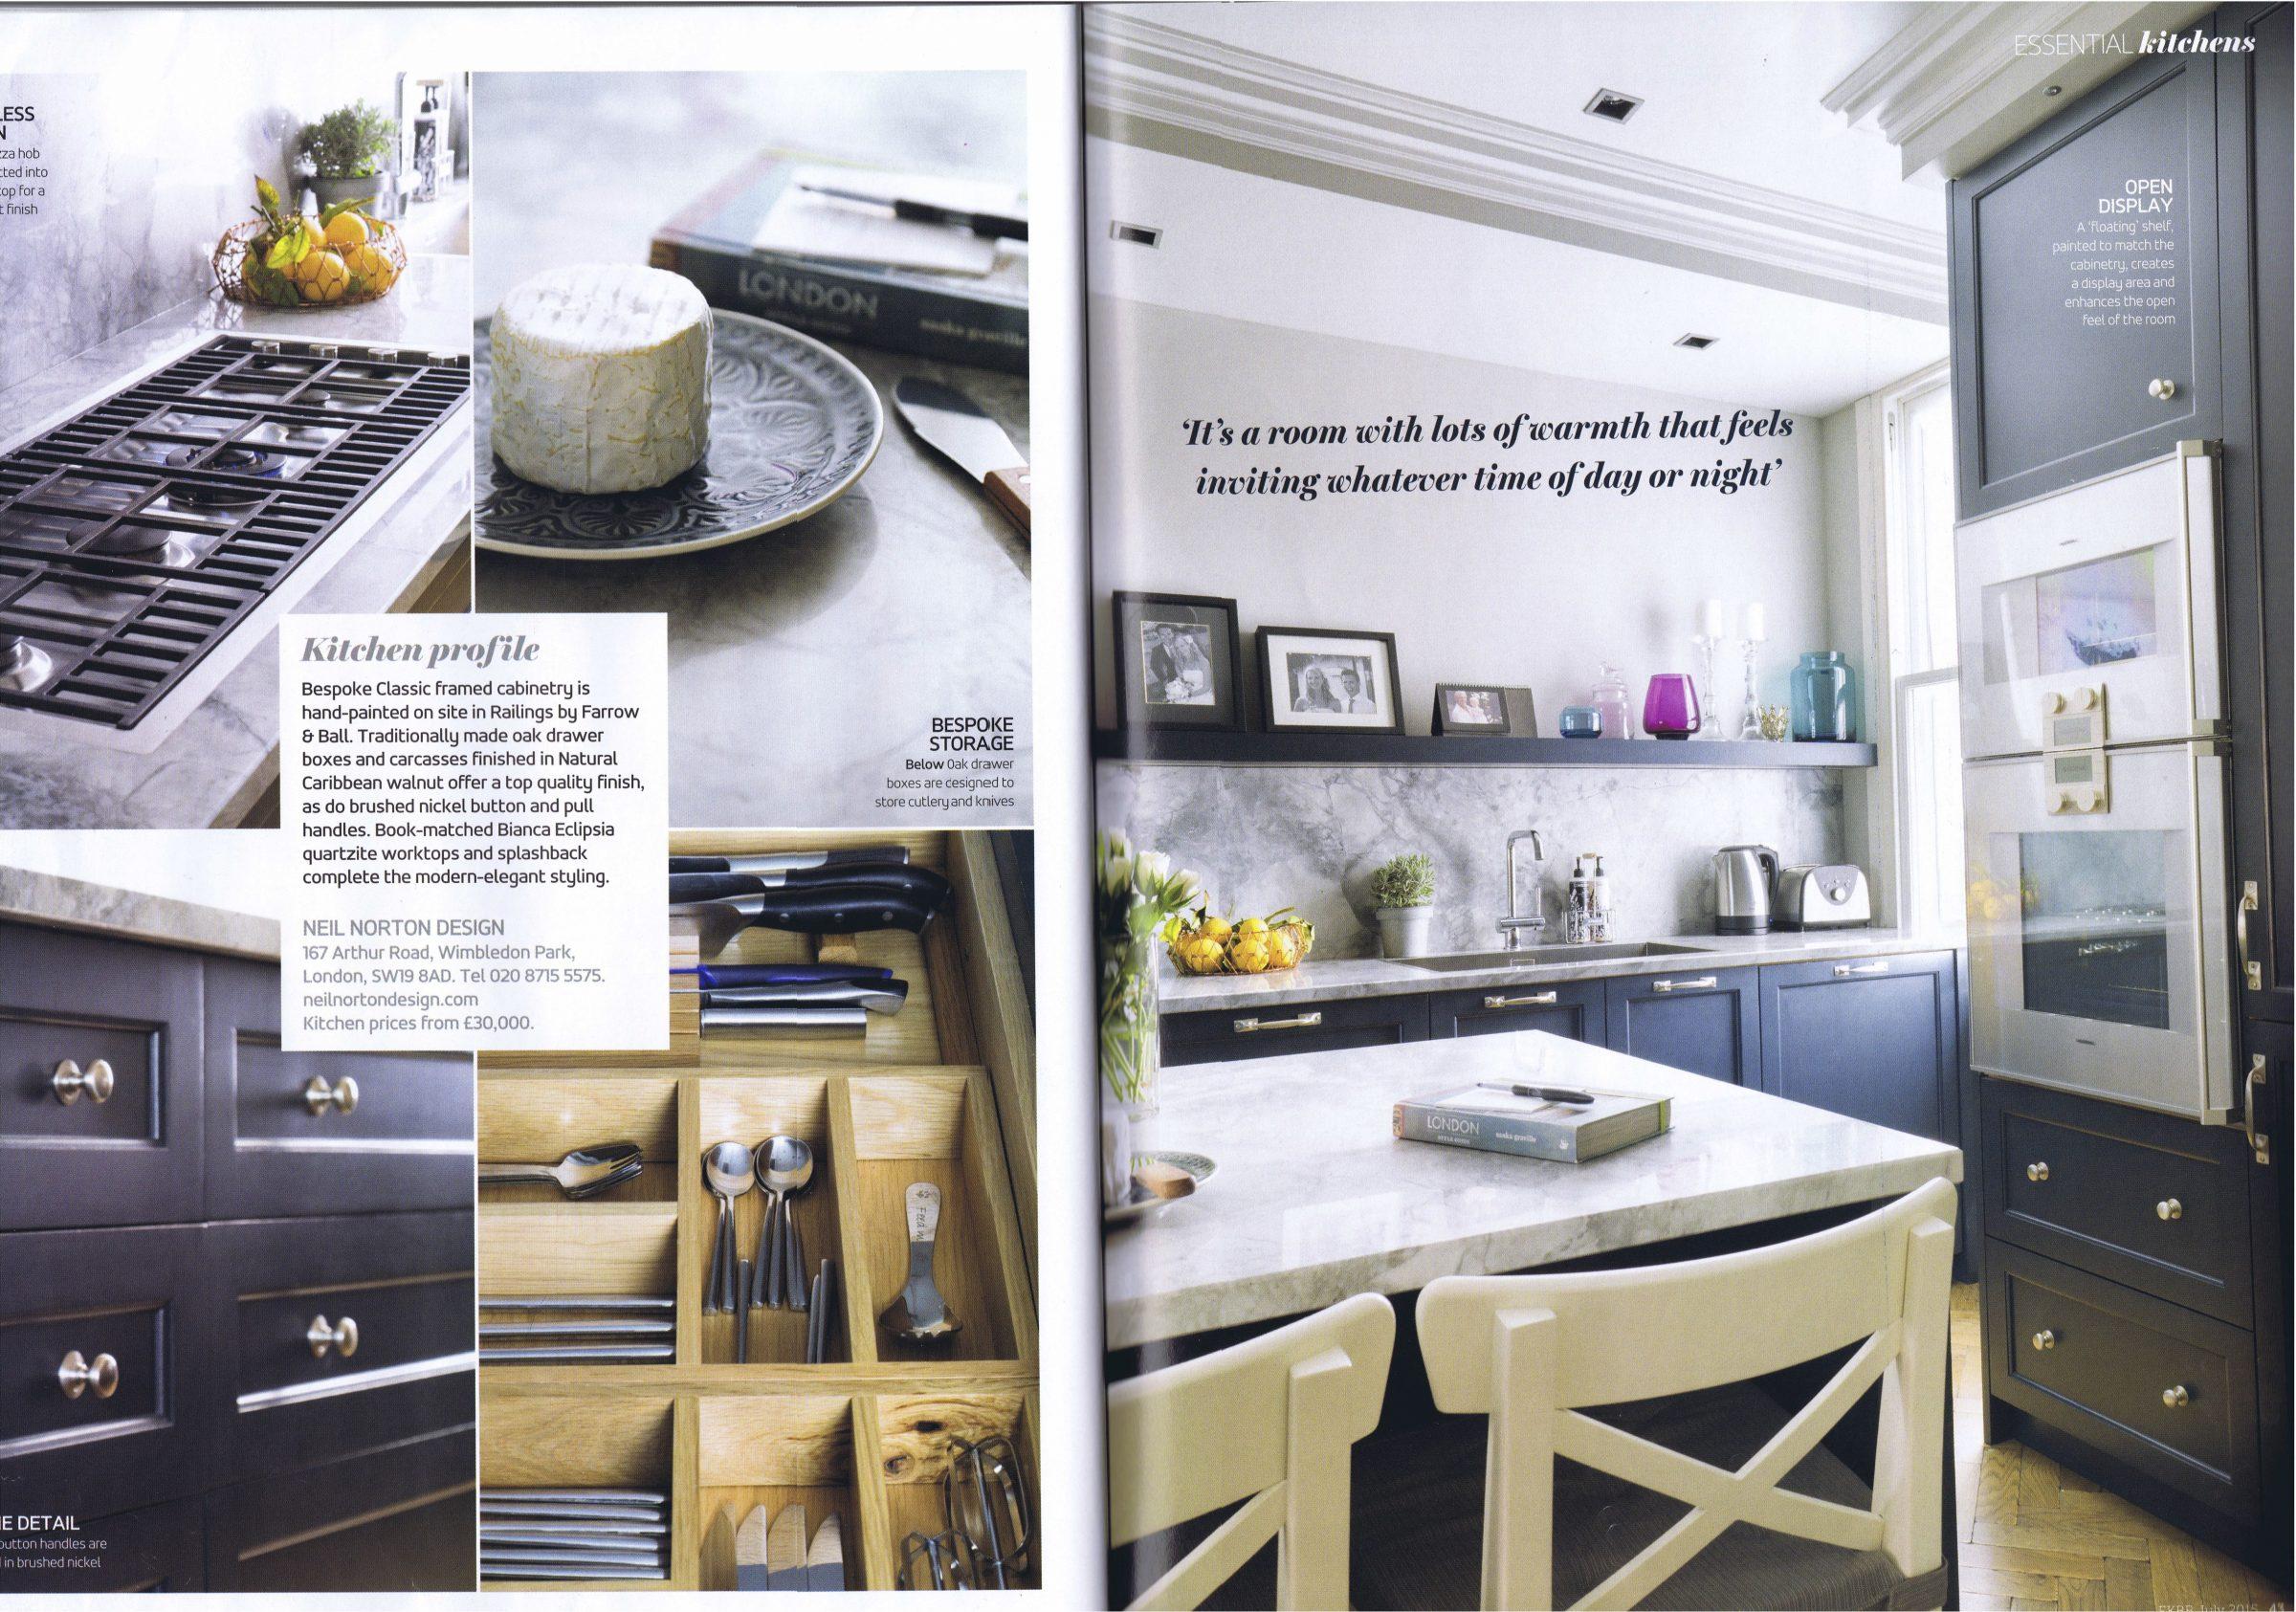 Essential Kitchen Bathroom Bedroom magazine